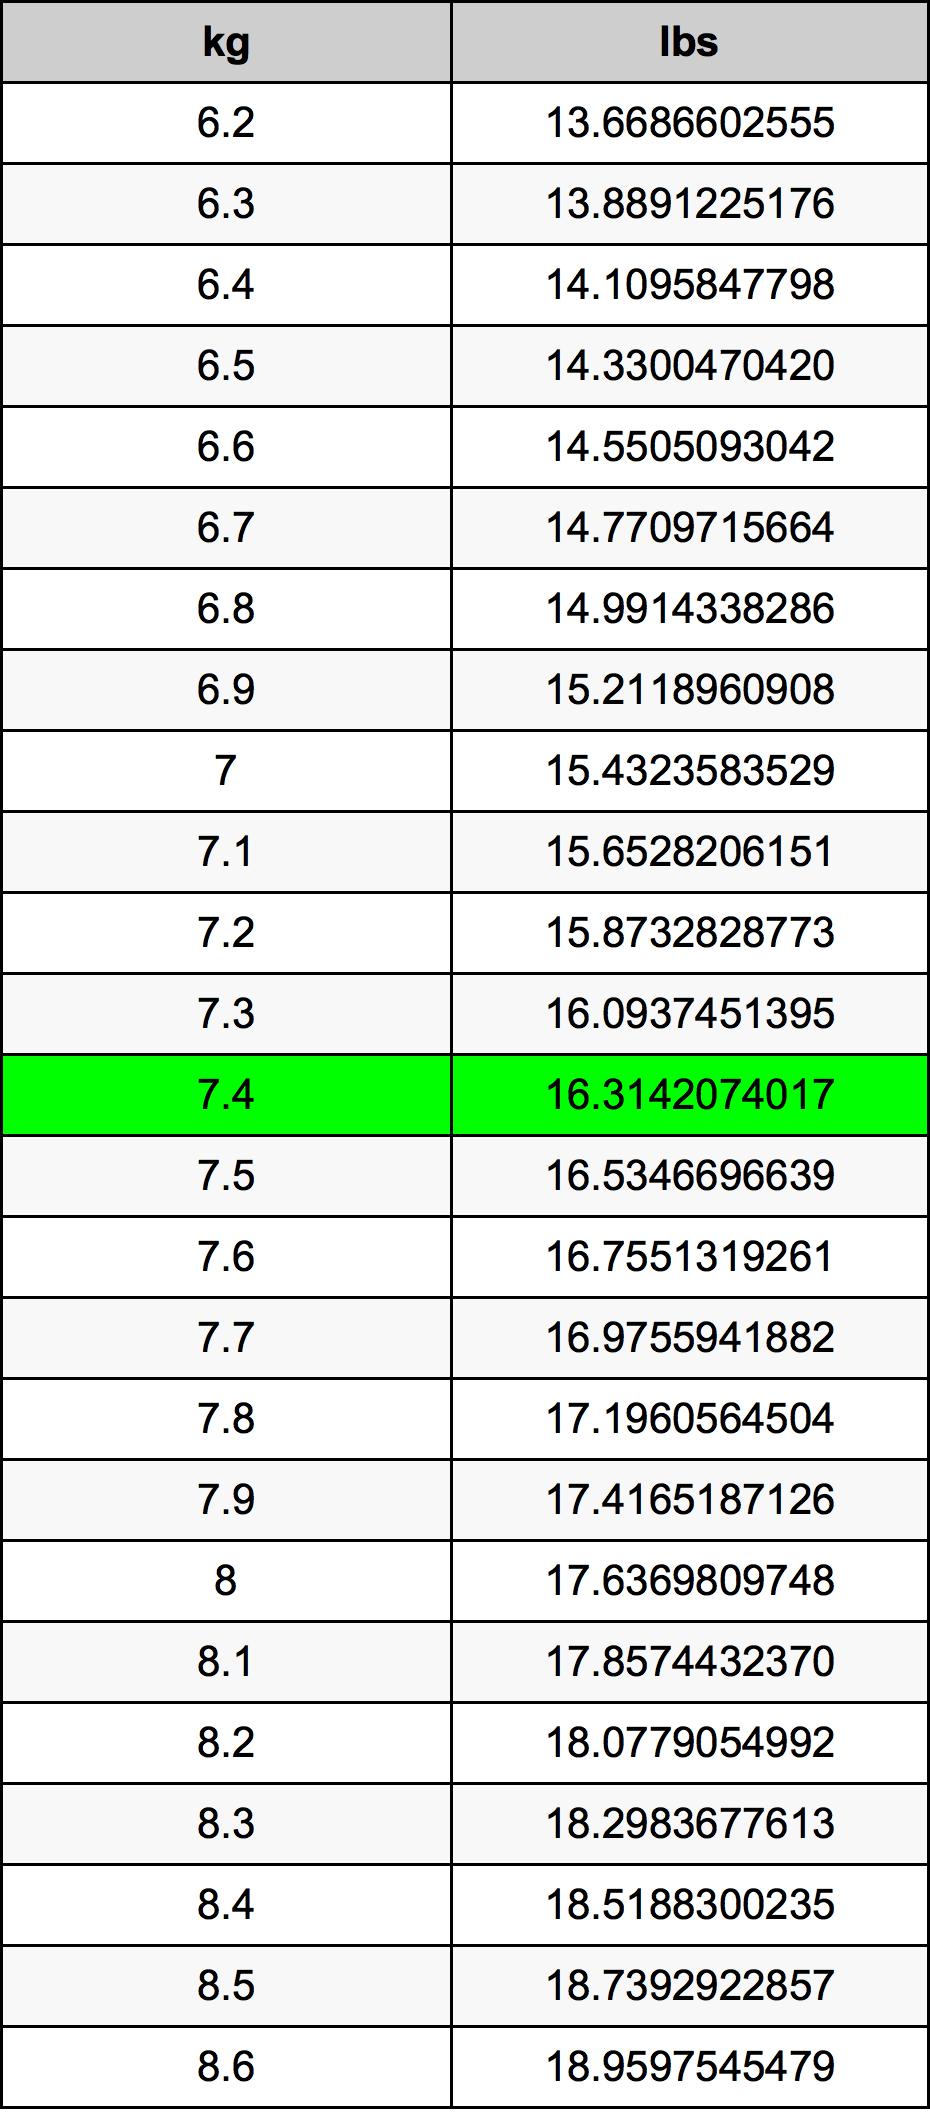 7.4 Kilogramma konverżjoni tabella